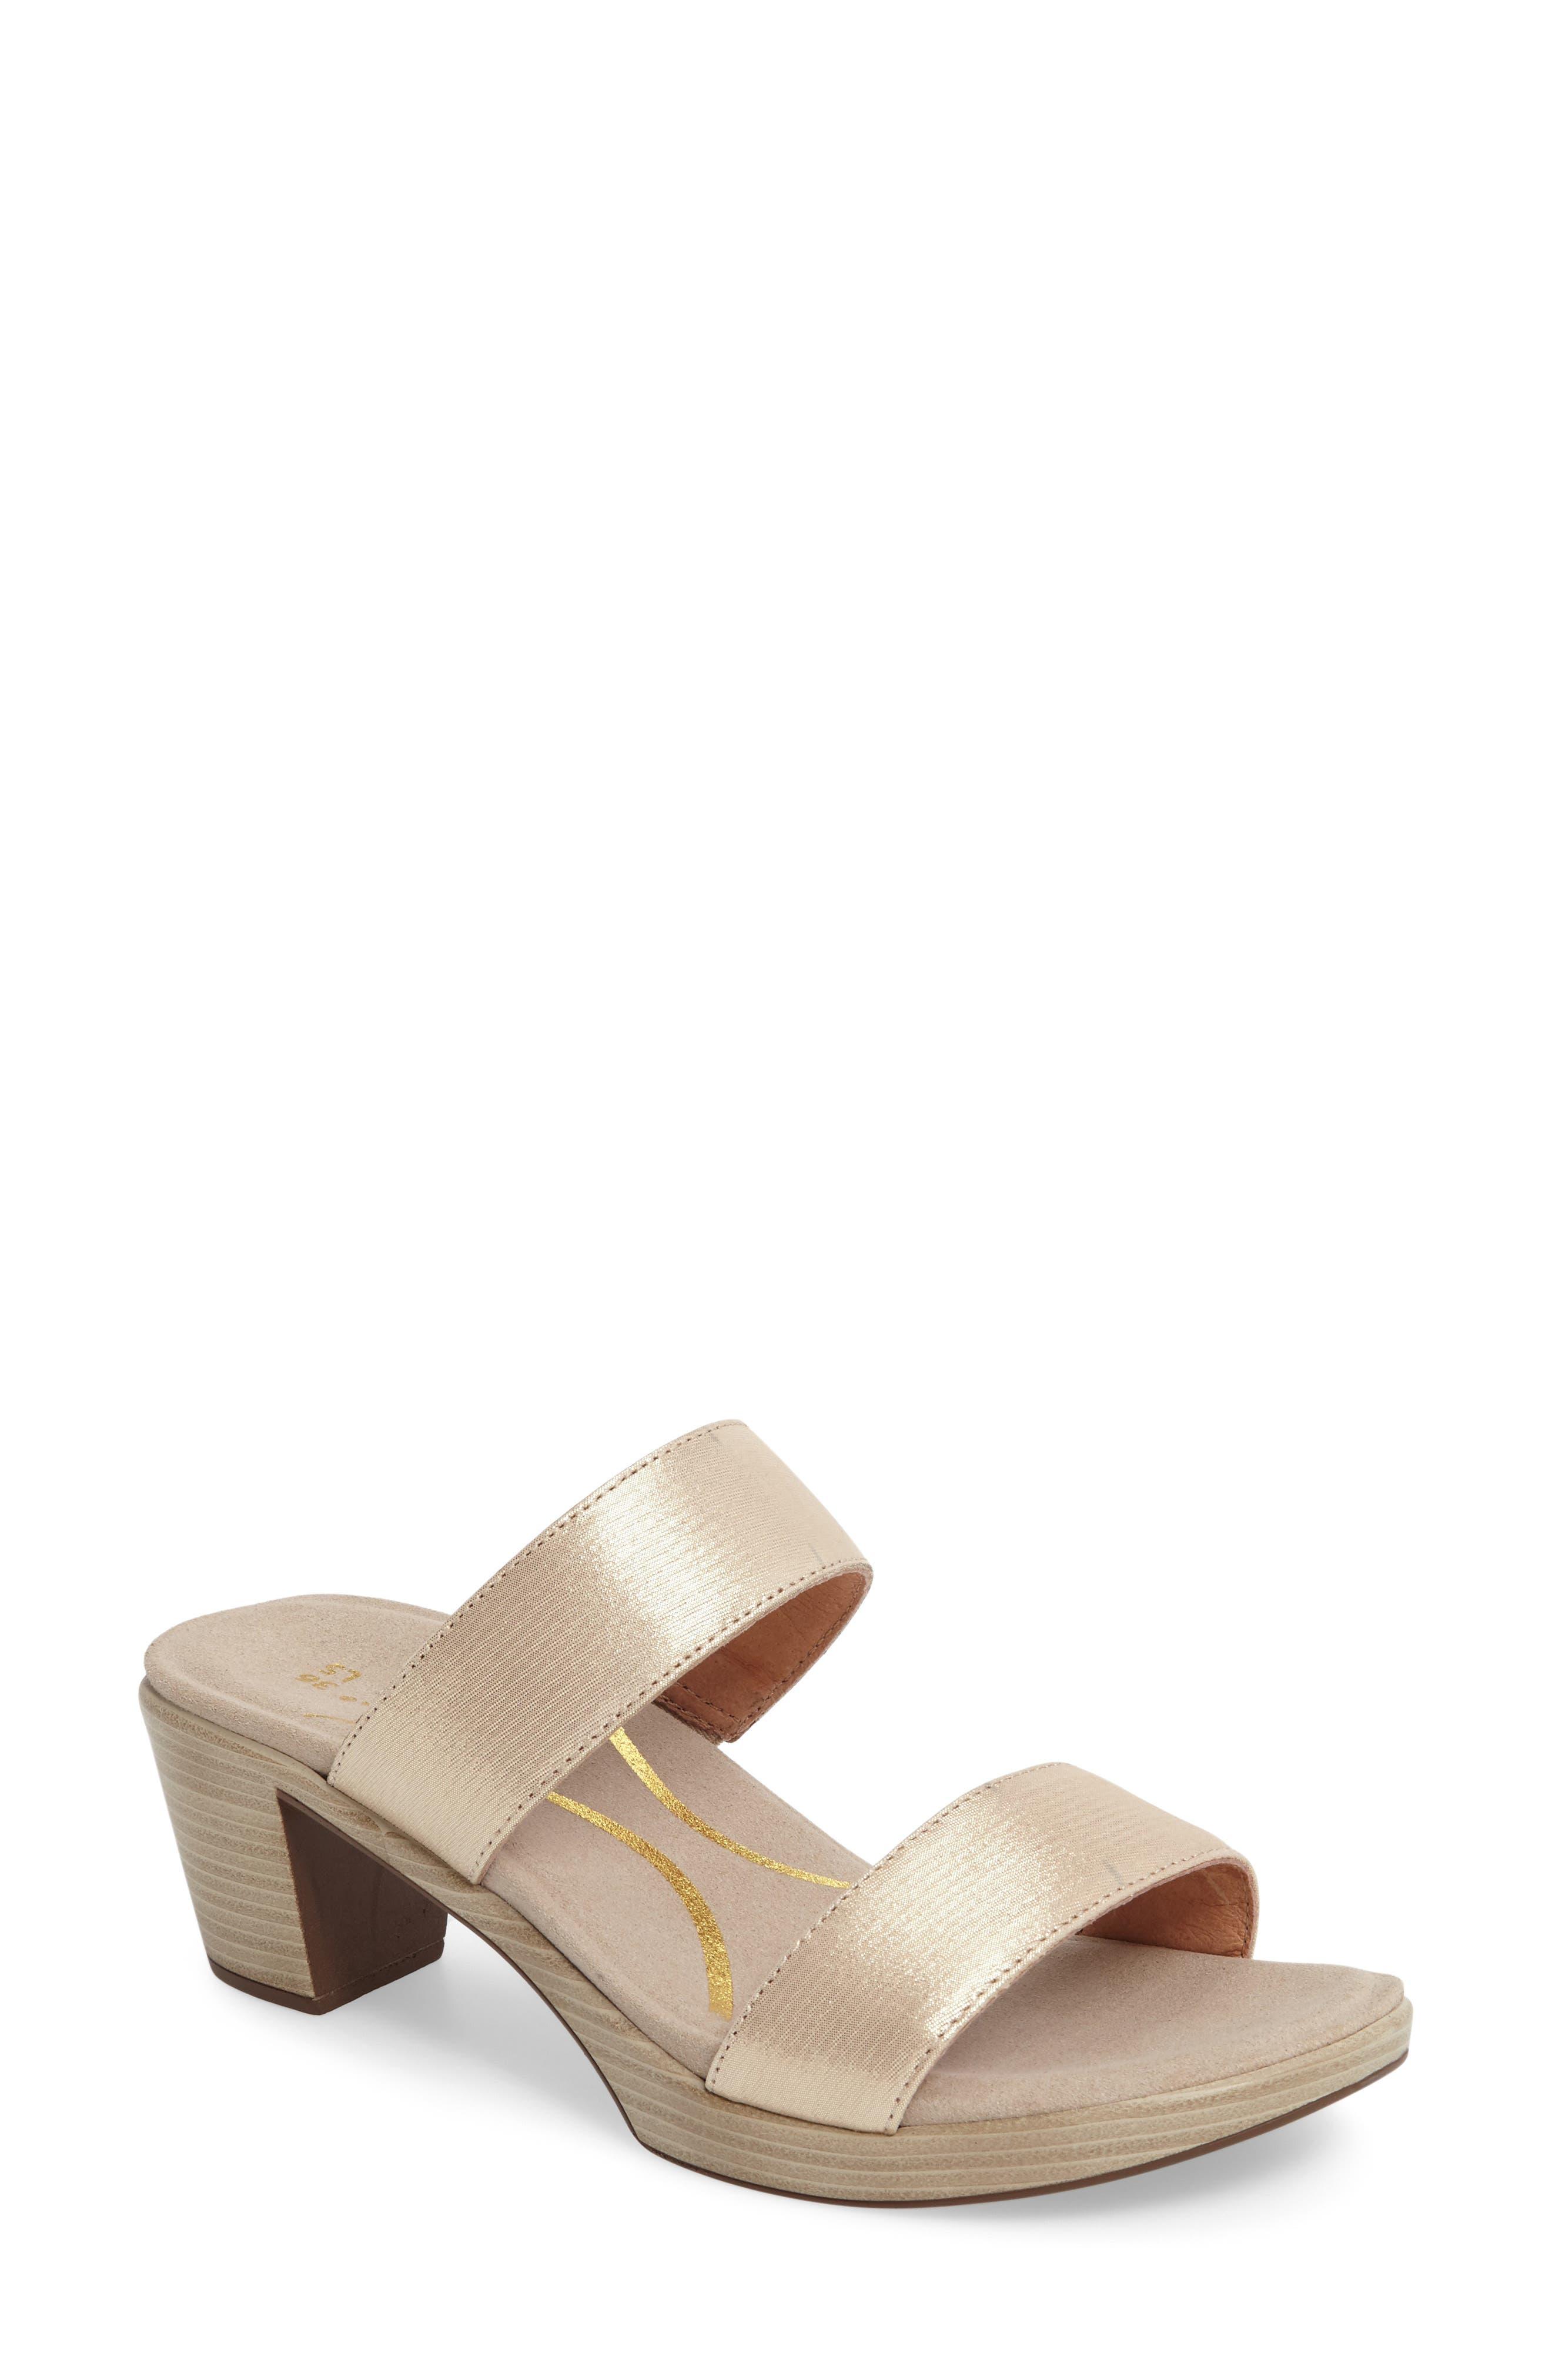 Main Image - Naot Fate Platform Sandal (Women)